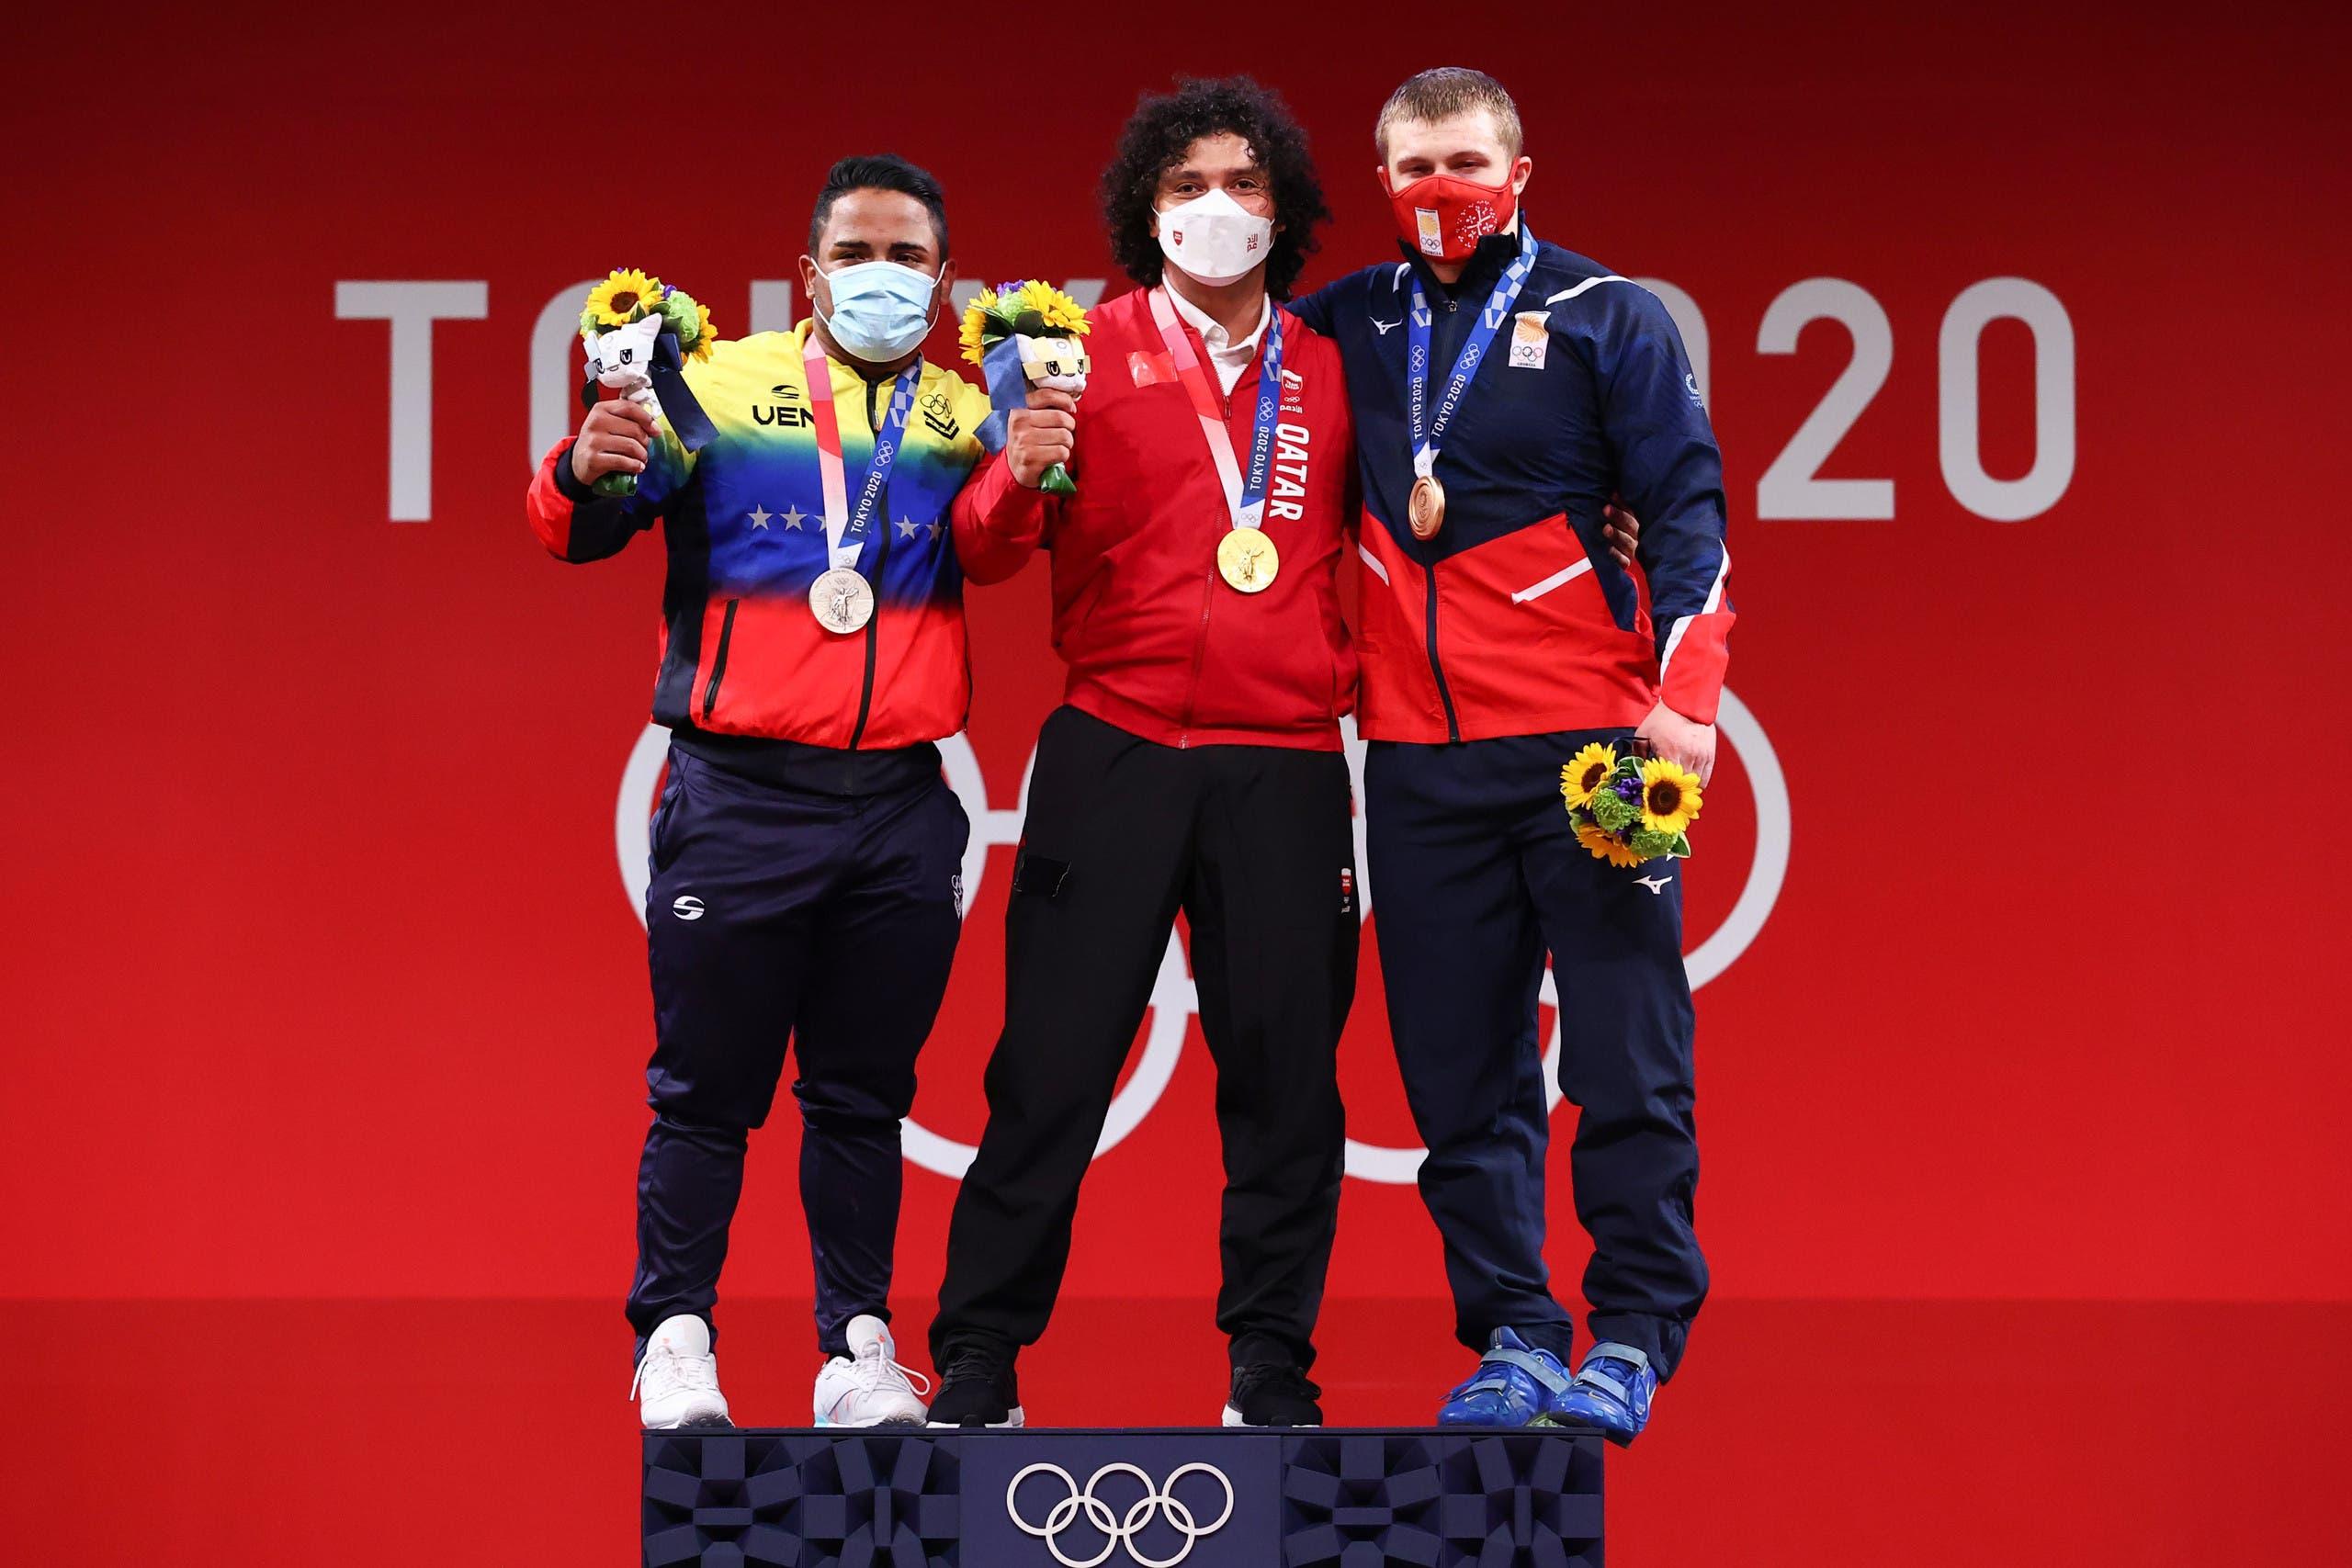 Gold medalist Fares Ibrahim Elbakh of Qatar, silver medalist Keydomar Vallenilla of Venezuela and bronze medalist Anton Pliesnoi of Georgia pose. (Reuters)